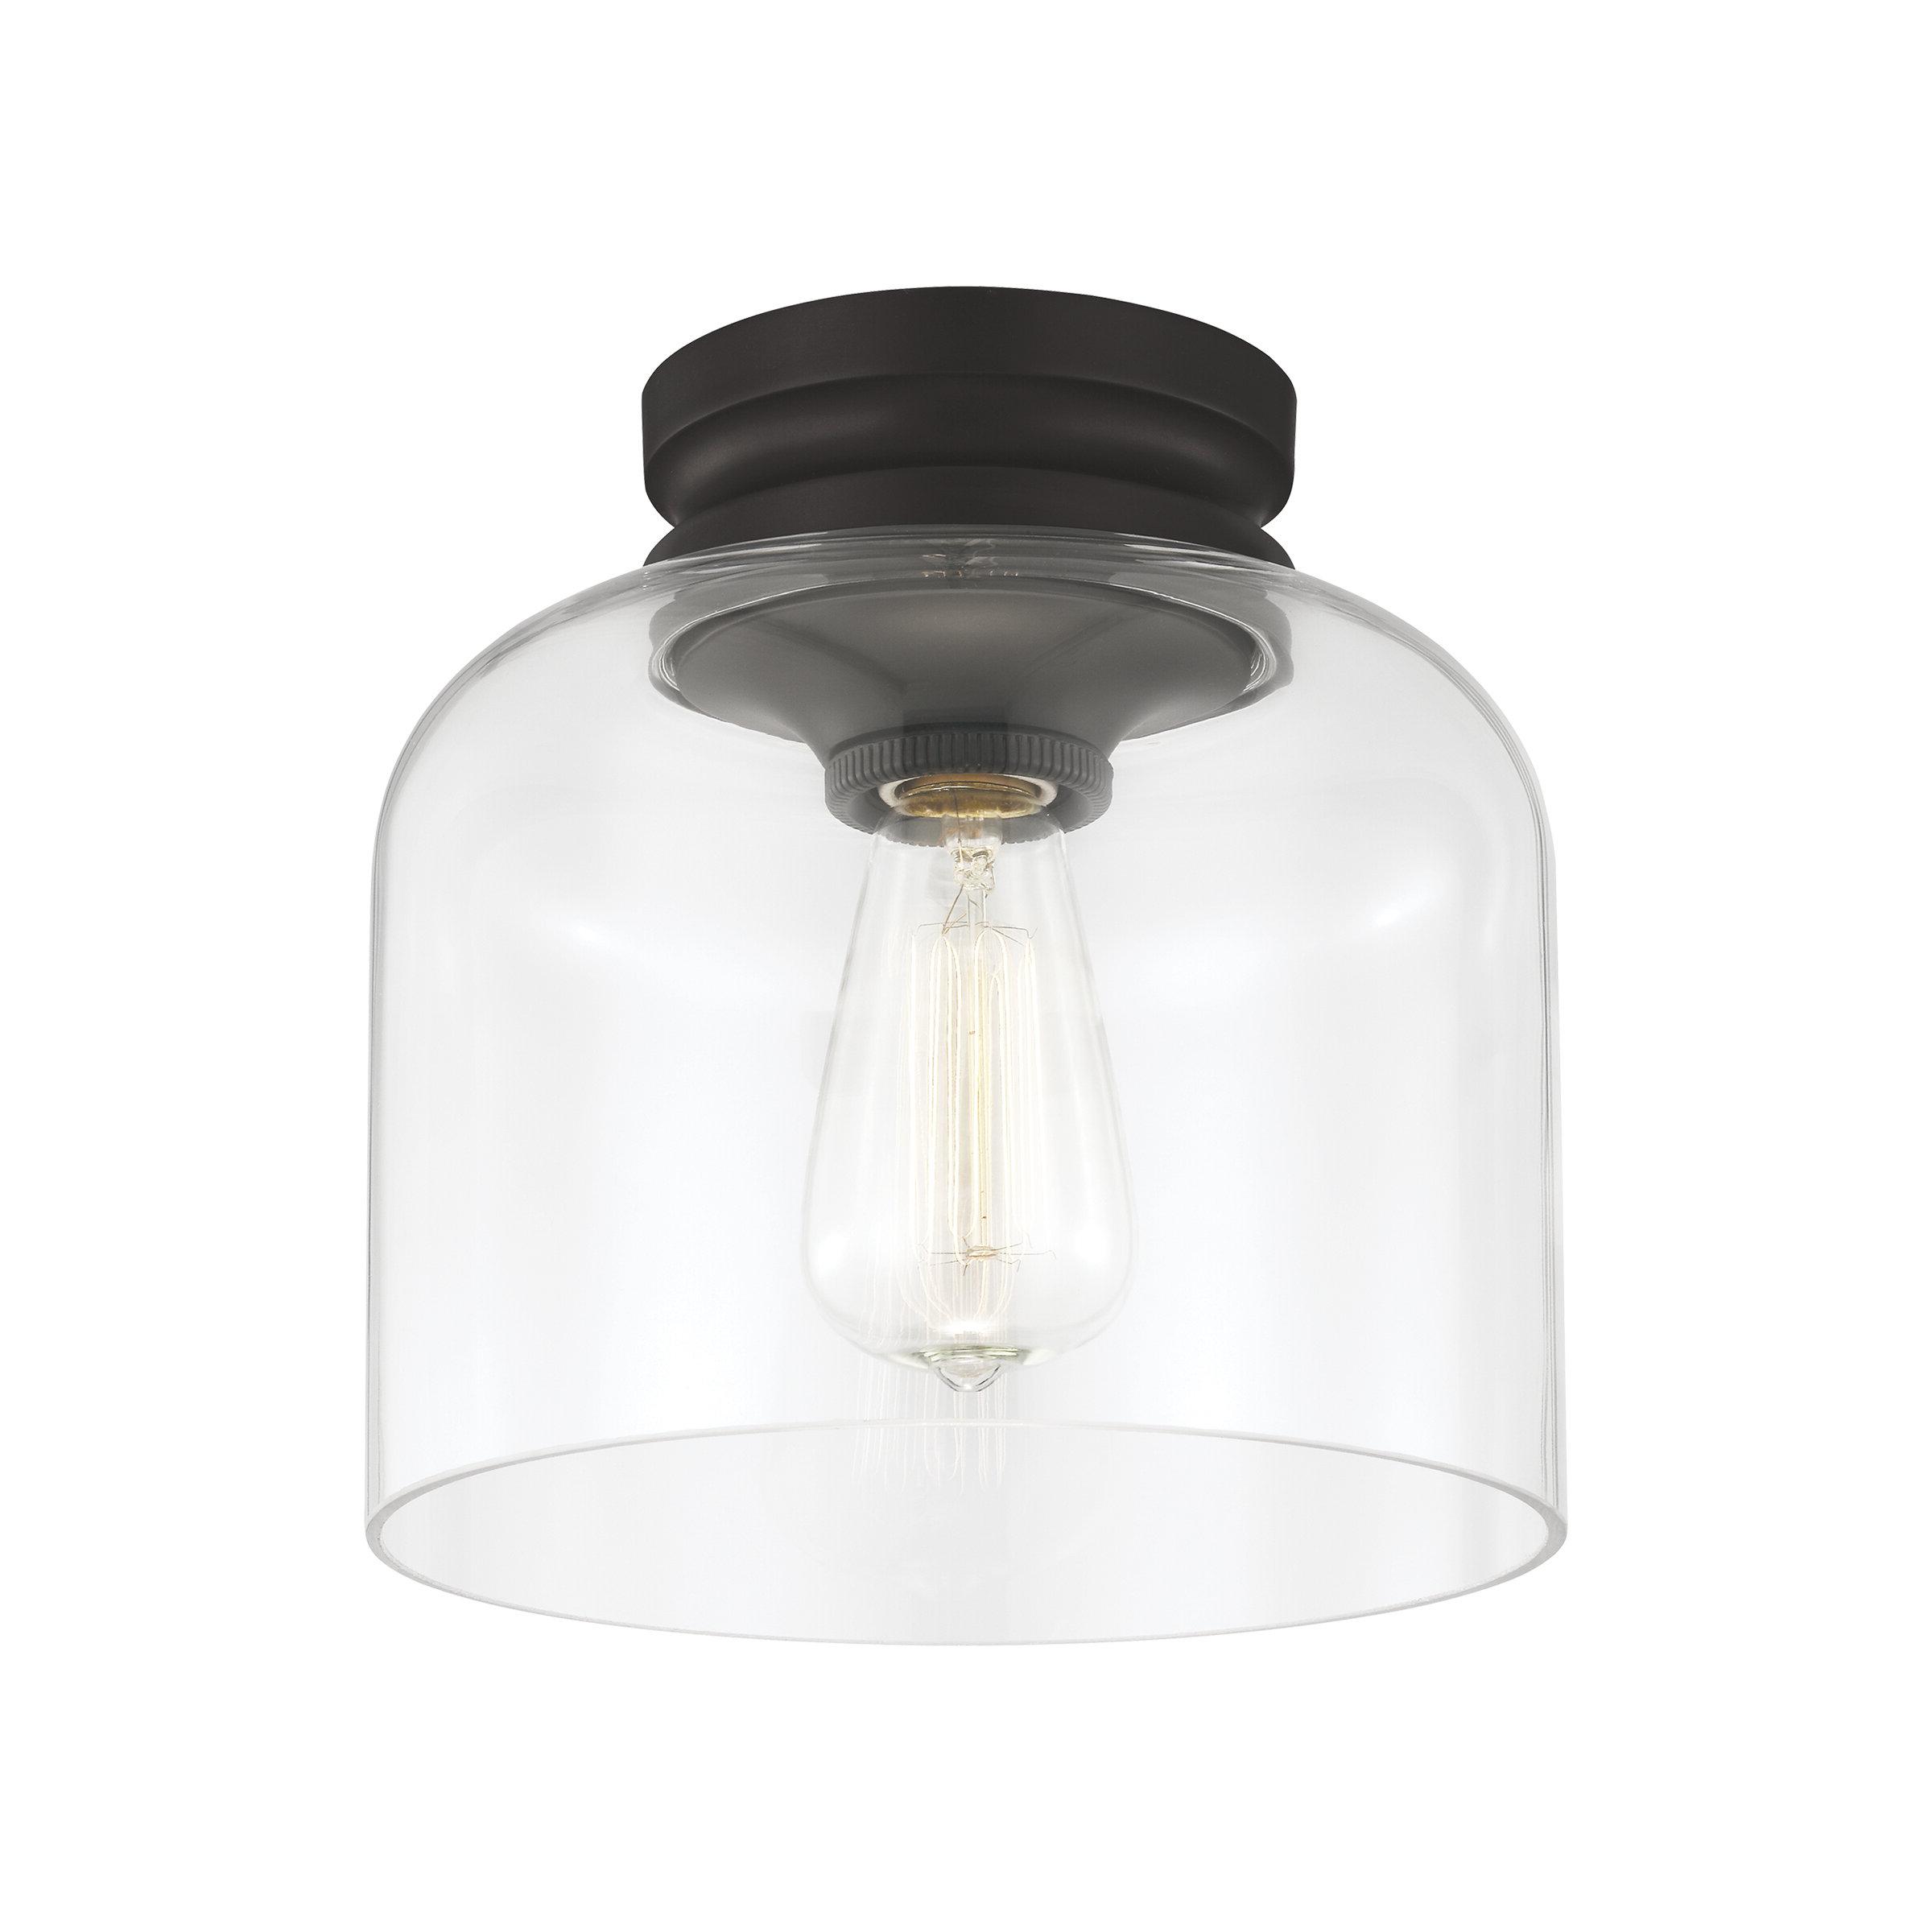 Best And Newest Nolan 1 Light Single Cylinder Pendants In Nolan 1 Light Semi Flush Mount (Gallery 11 of 20)